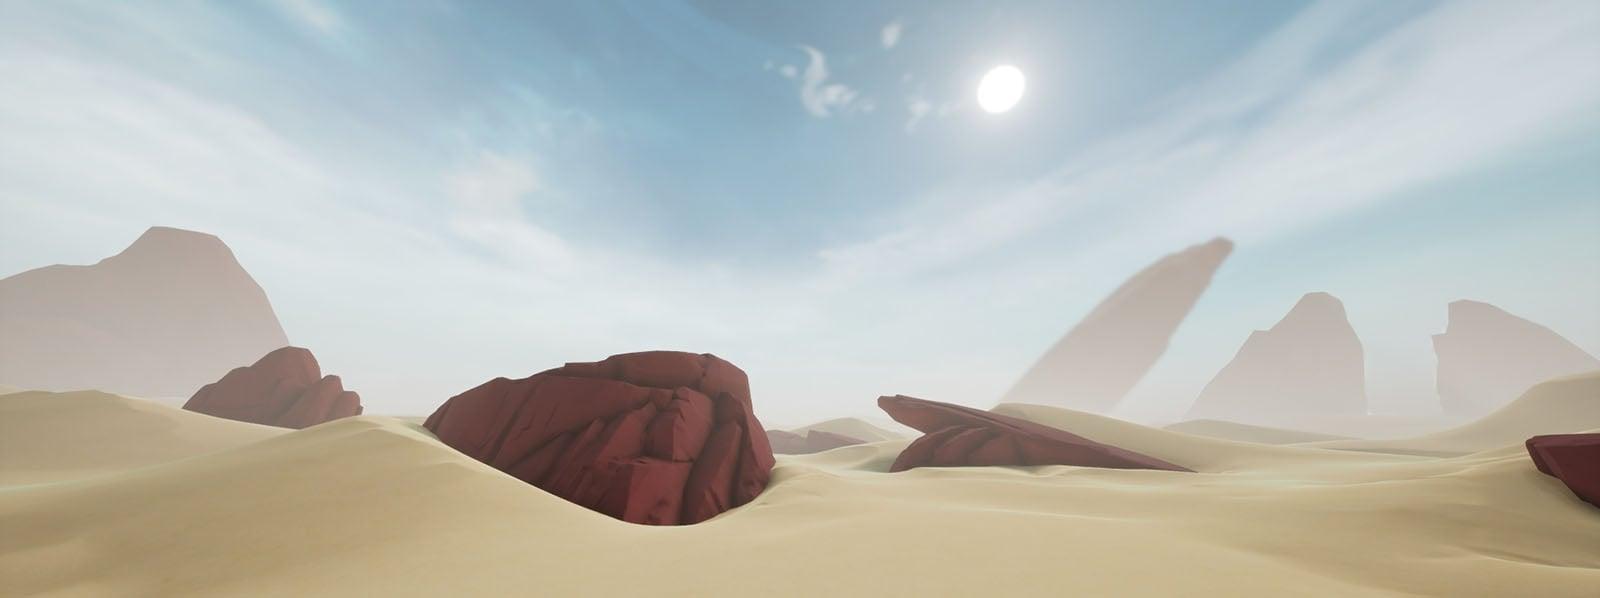 Rev-Share] UE4 Multiplayer Coop game needs an animator